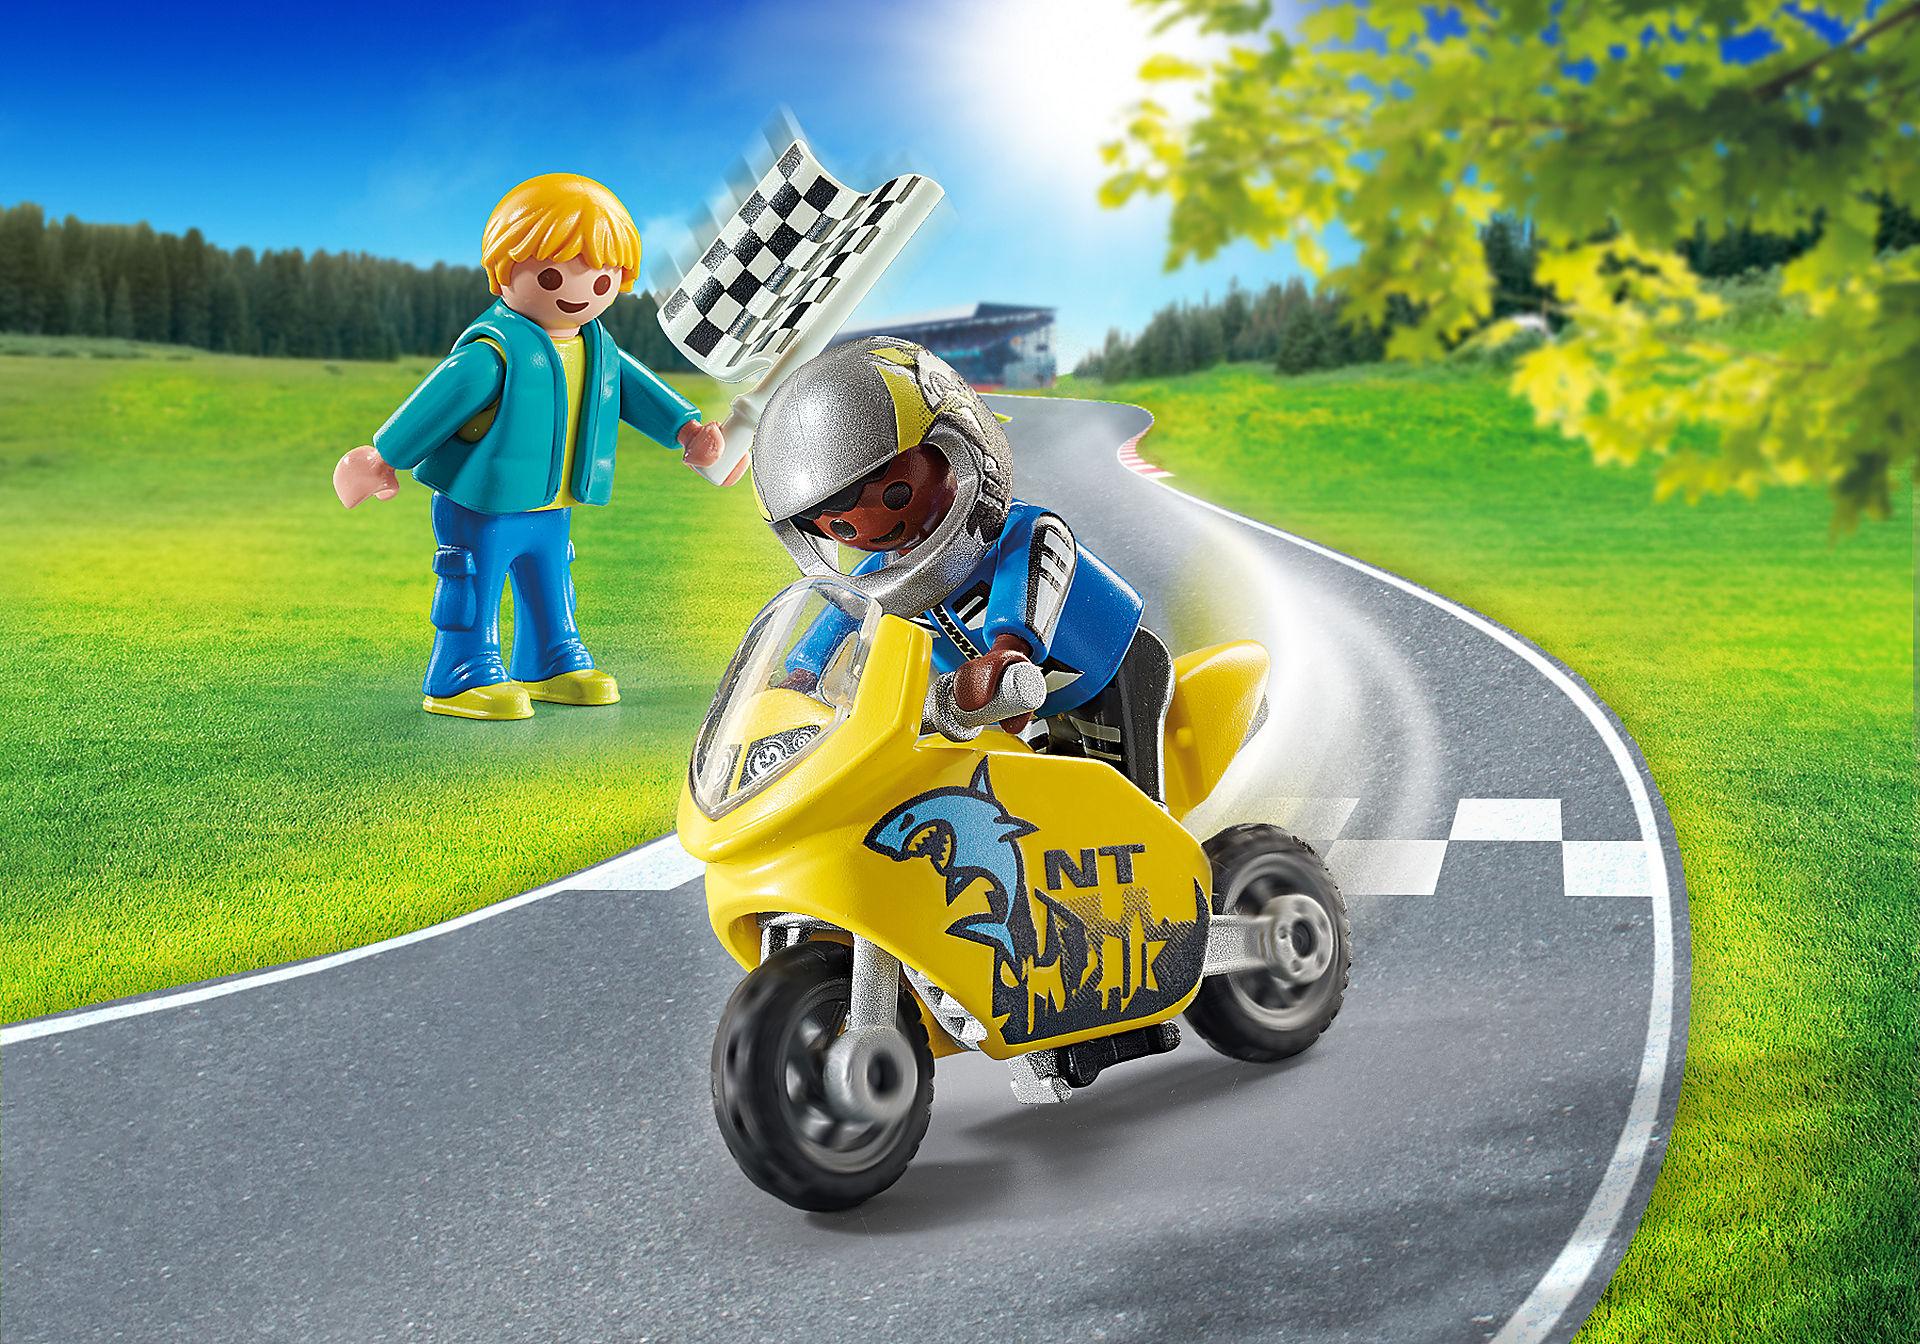 70380 Enfants et moto  zoom image1